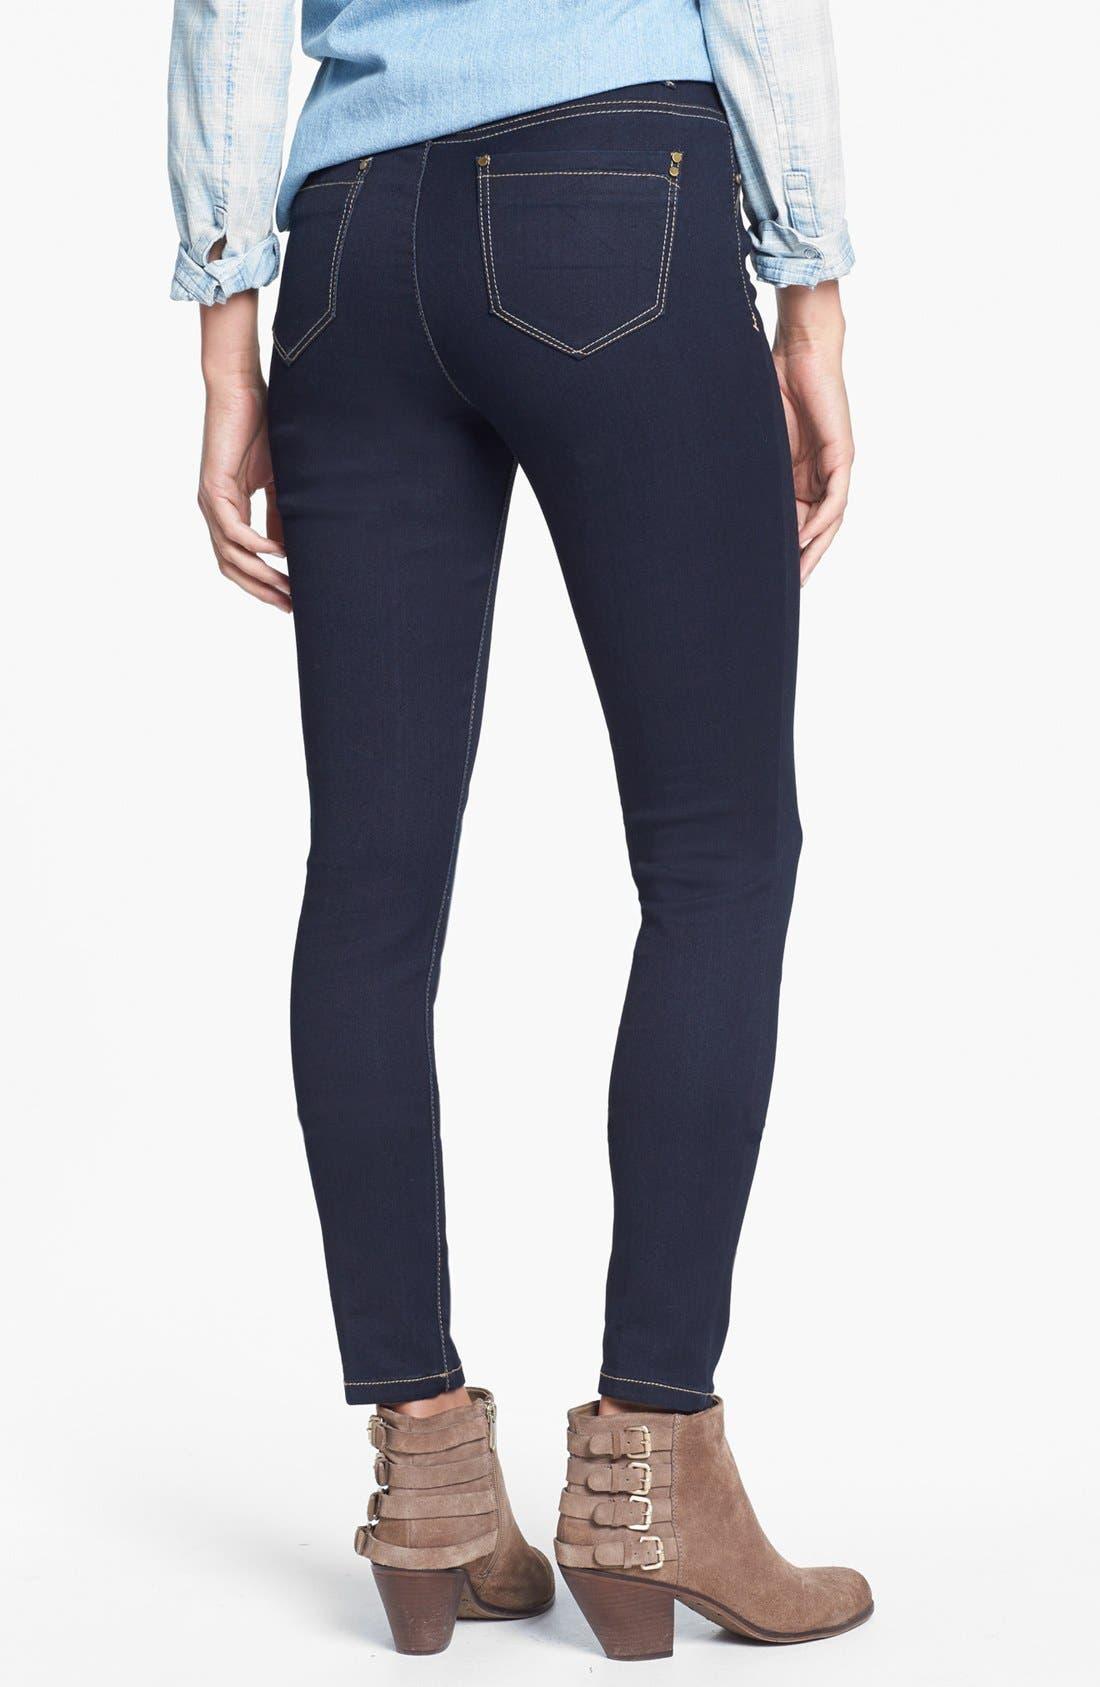 Alternate Image 2  - Jolt High Waist Skinny Jeans (Dark) (Juniors)